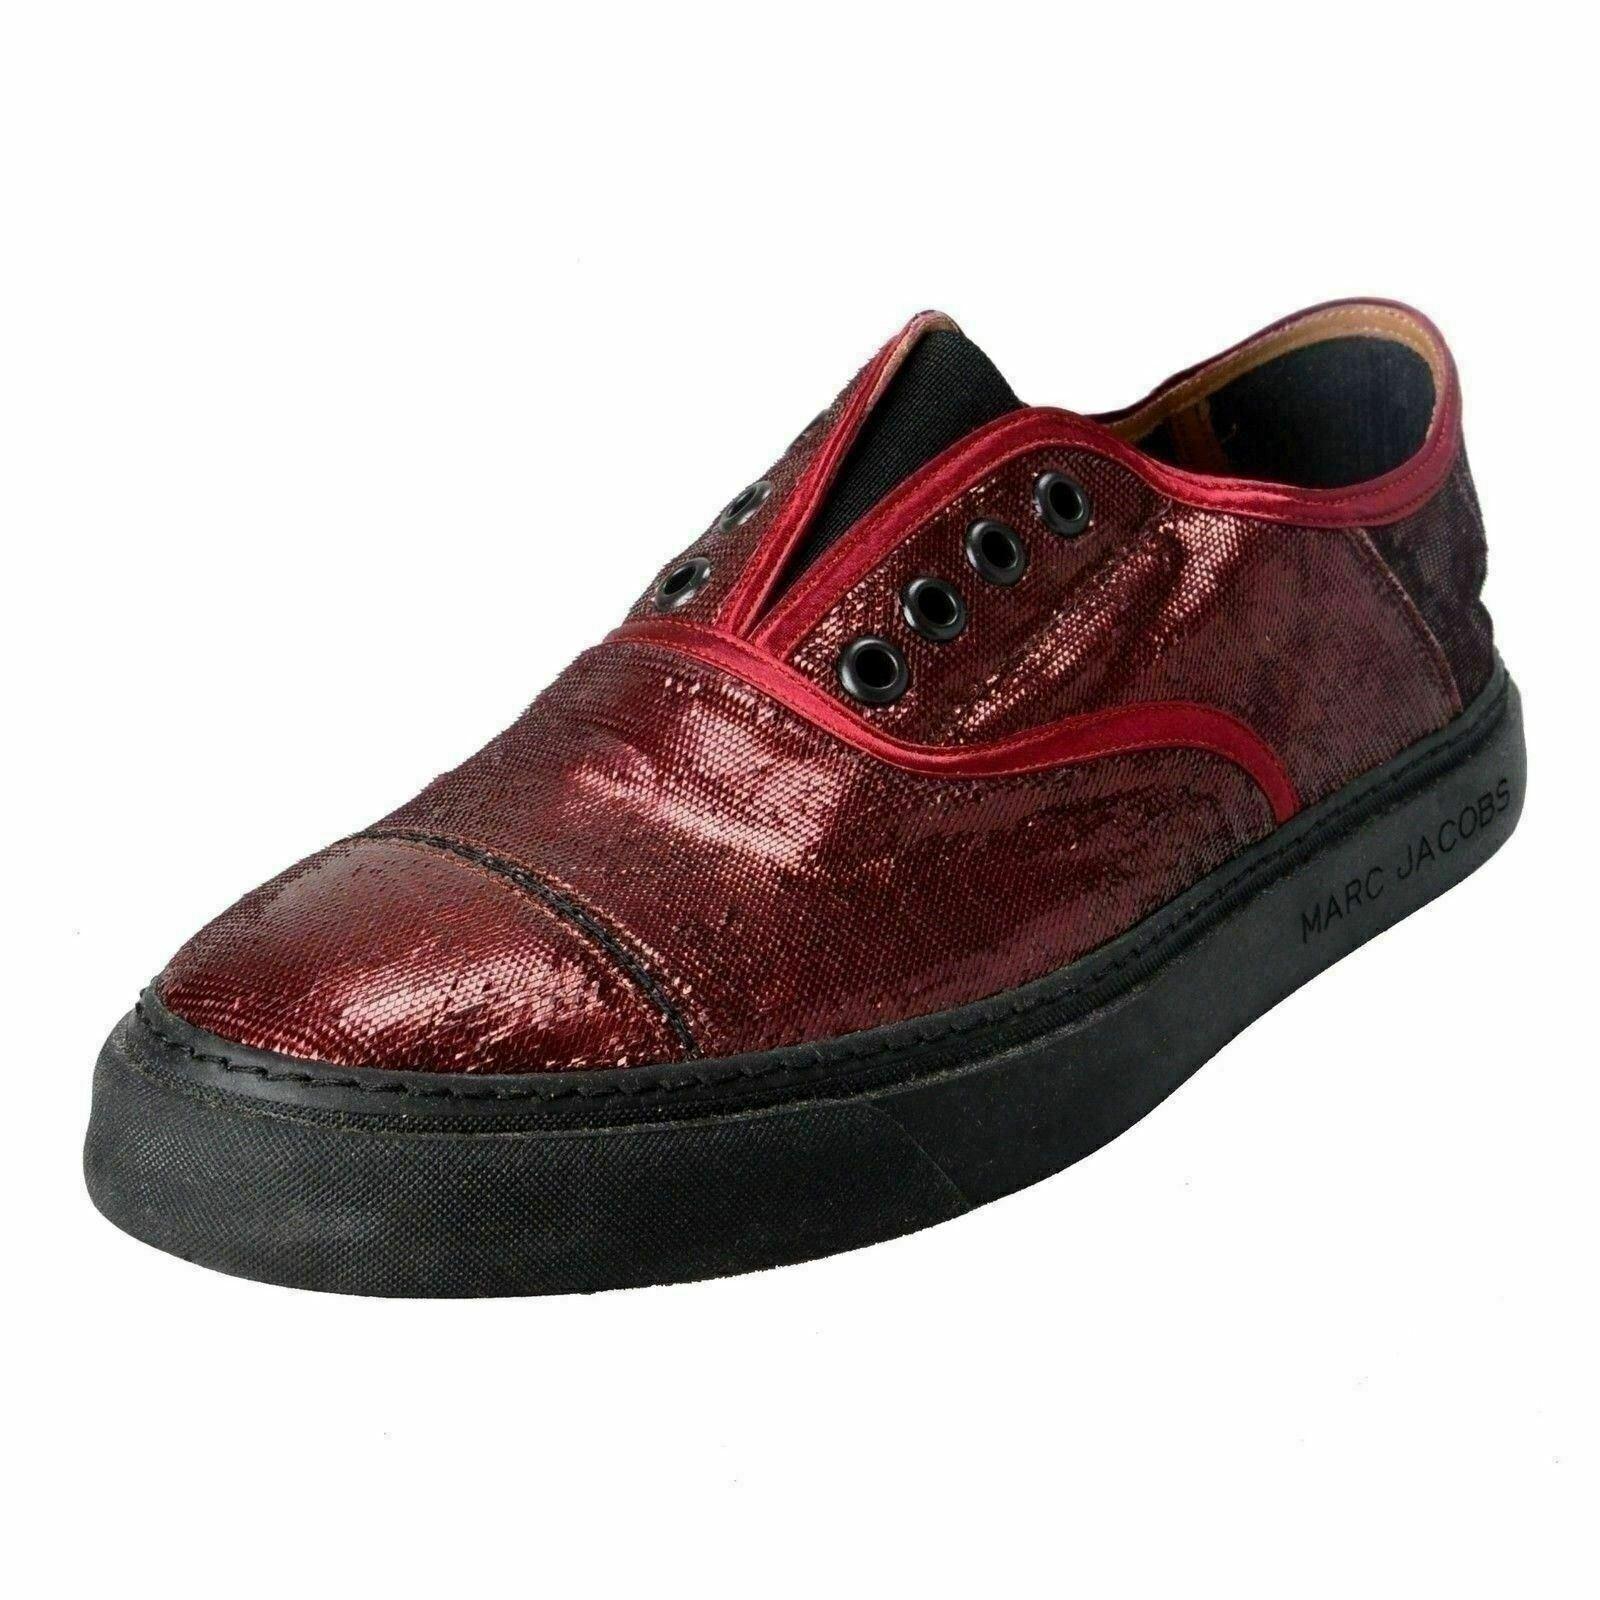 Marc Jacobs Men's Vine Sparkle Leather Loafers Slip On shoes US 10 IT 9